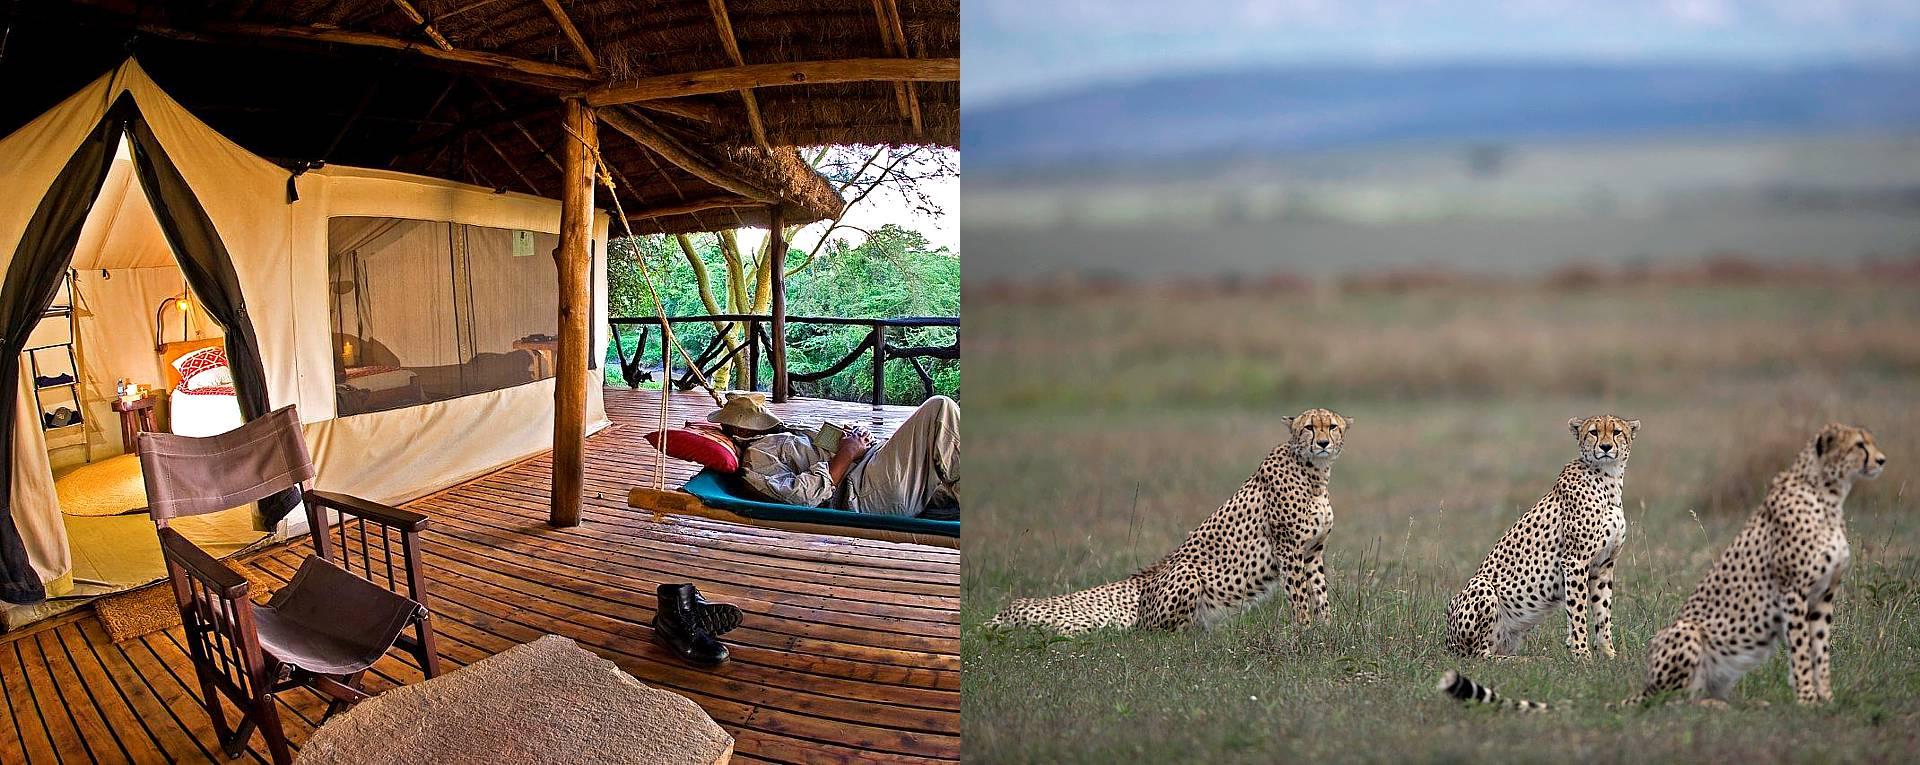 Expert Rating Reviews >> Basecamp Masai Mara, Masai Mara - Kenya - AfricanMecca ...